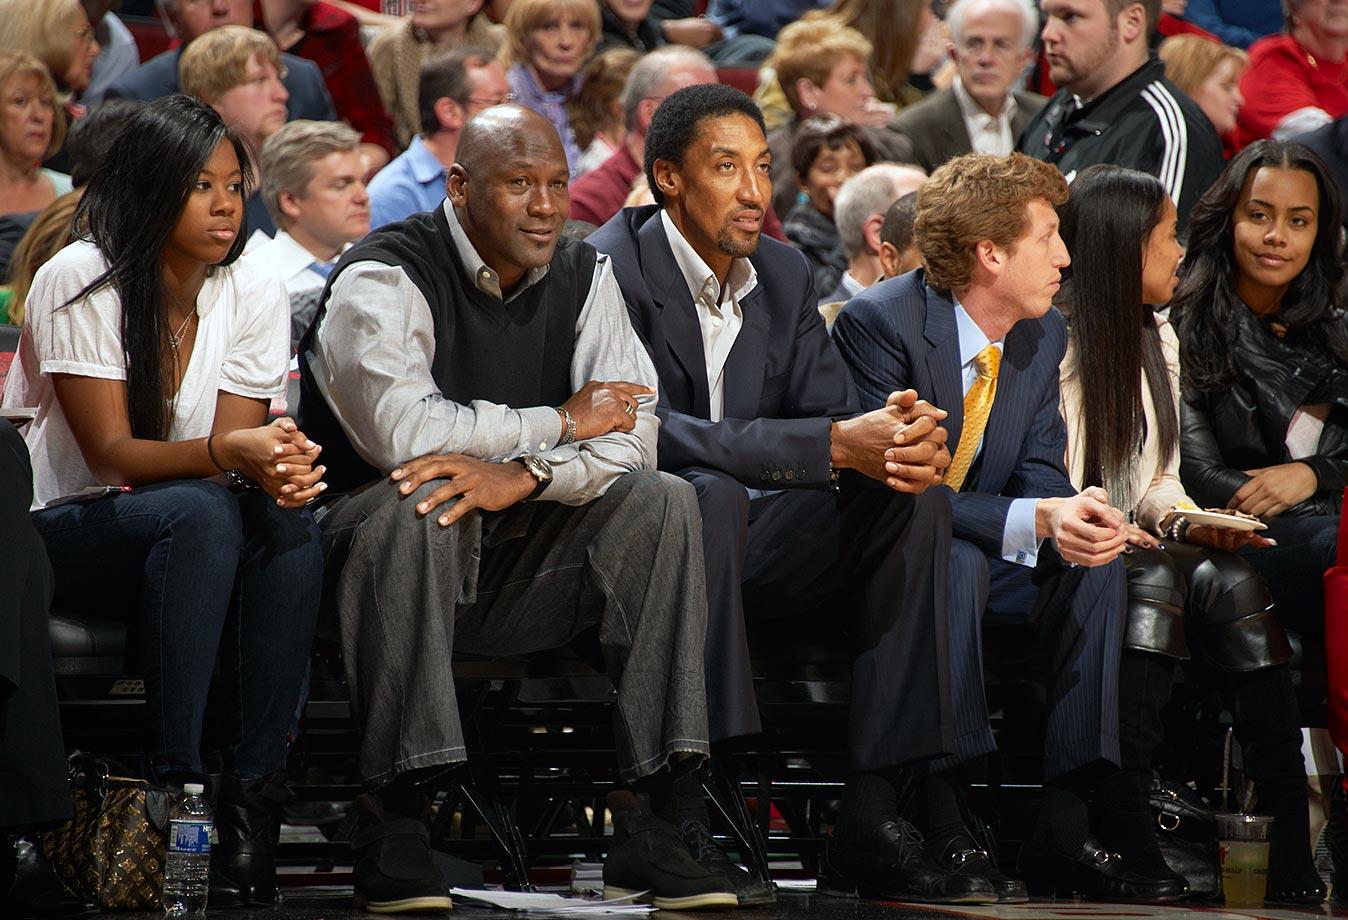 February 15, 2011 — Chicago Bulls vs Charlotte Bobcats